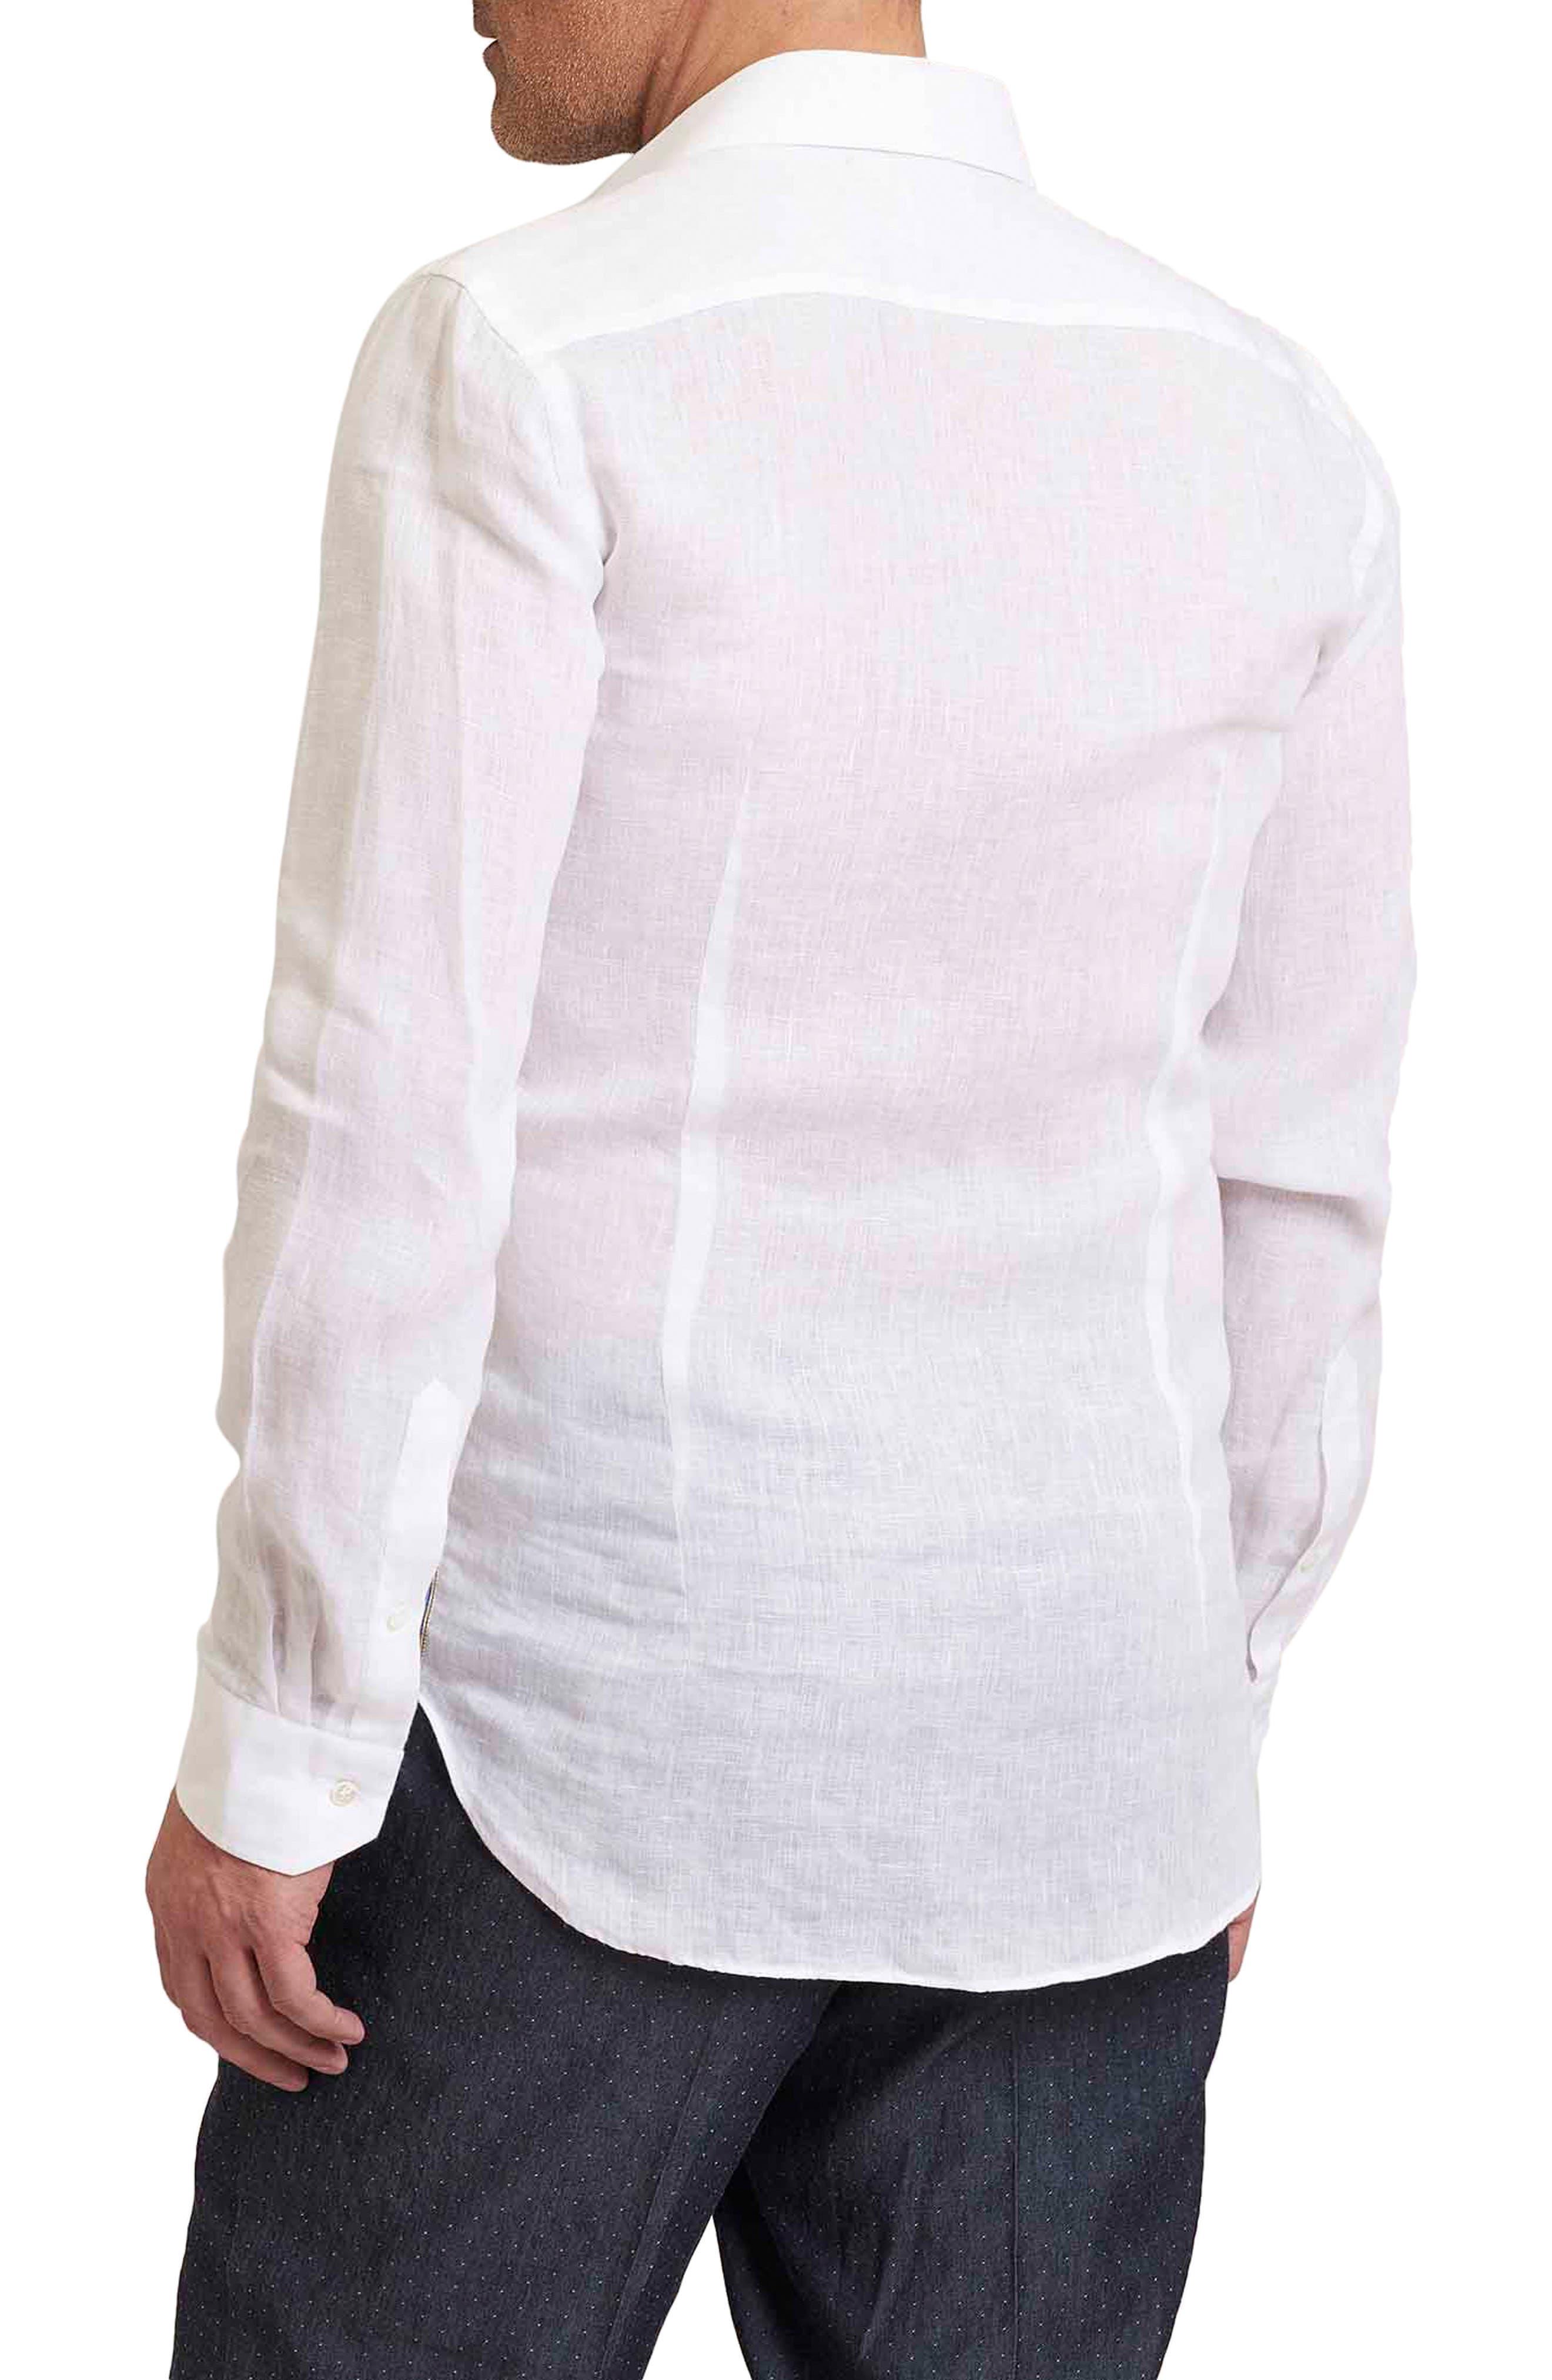 Delave Regular Fit Linen Sport Shirt,                             Alternate thumbnail 2, color,                             100